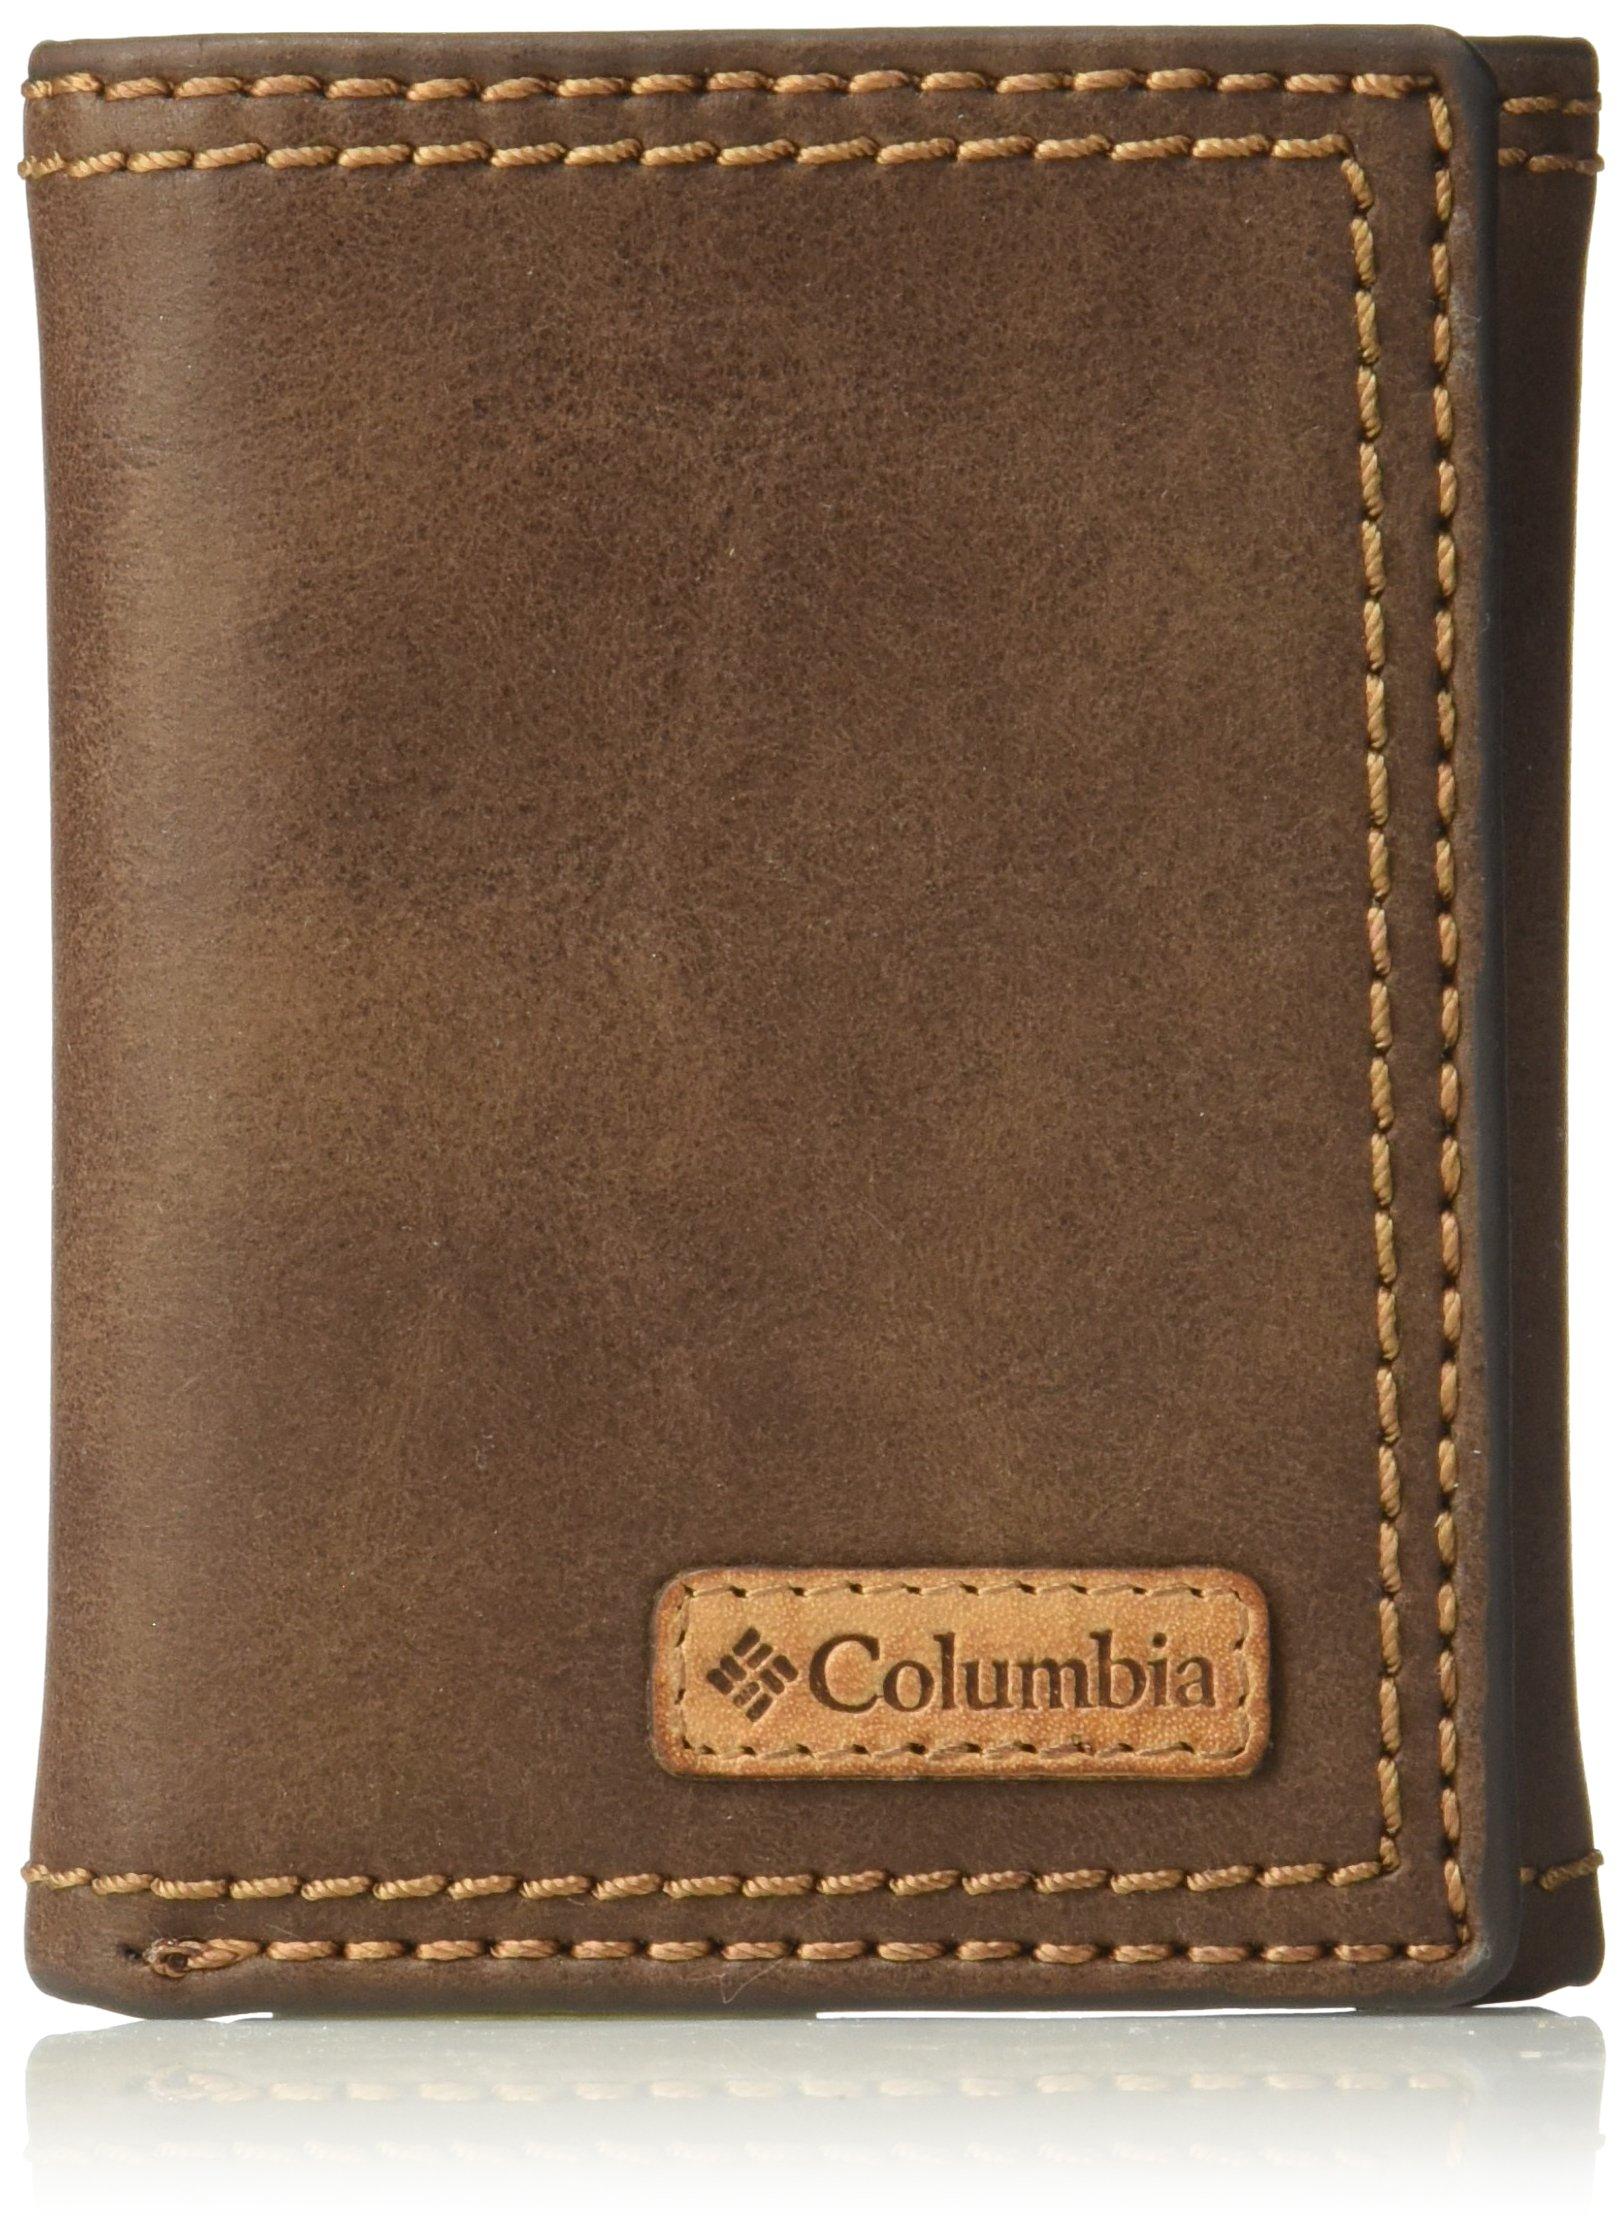 Columbia Blocking Trifold Wallet brown